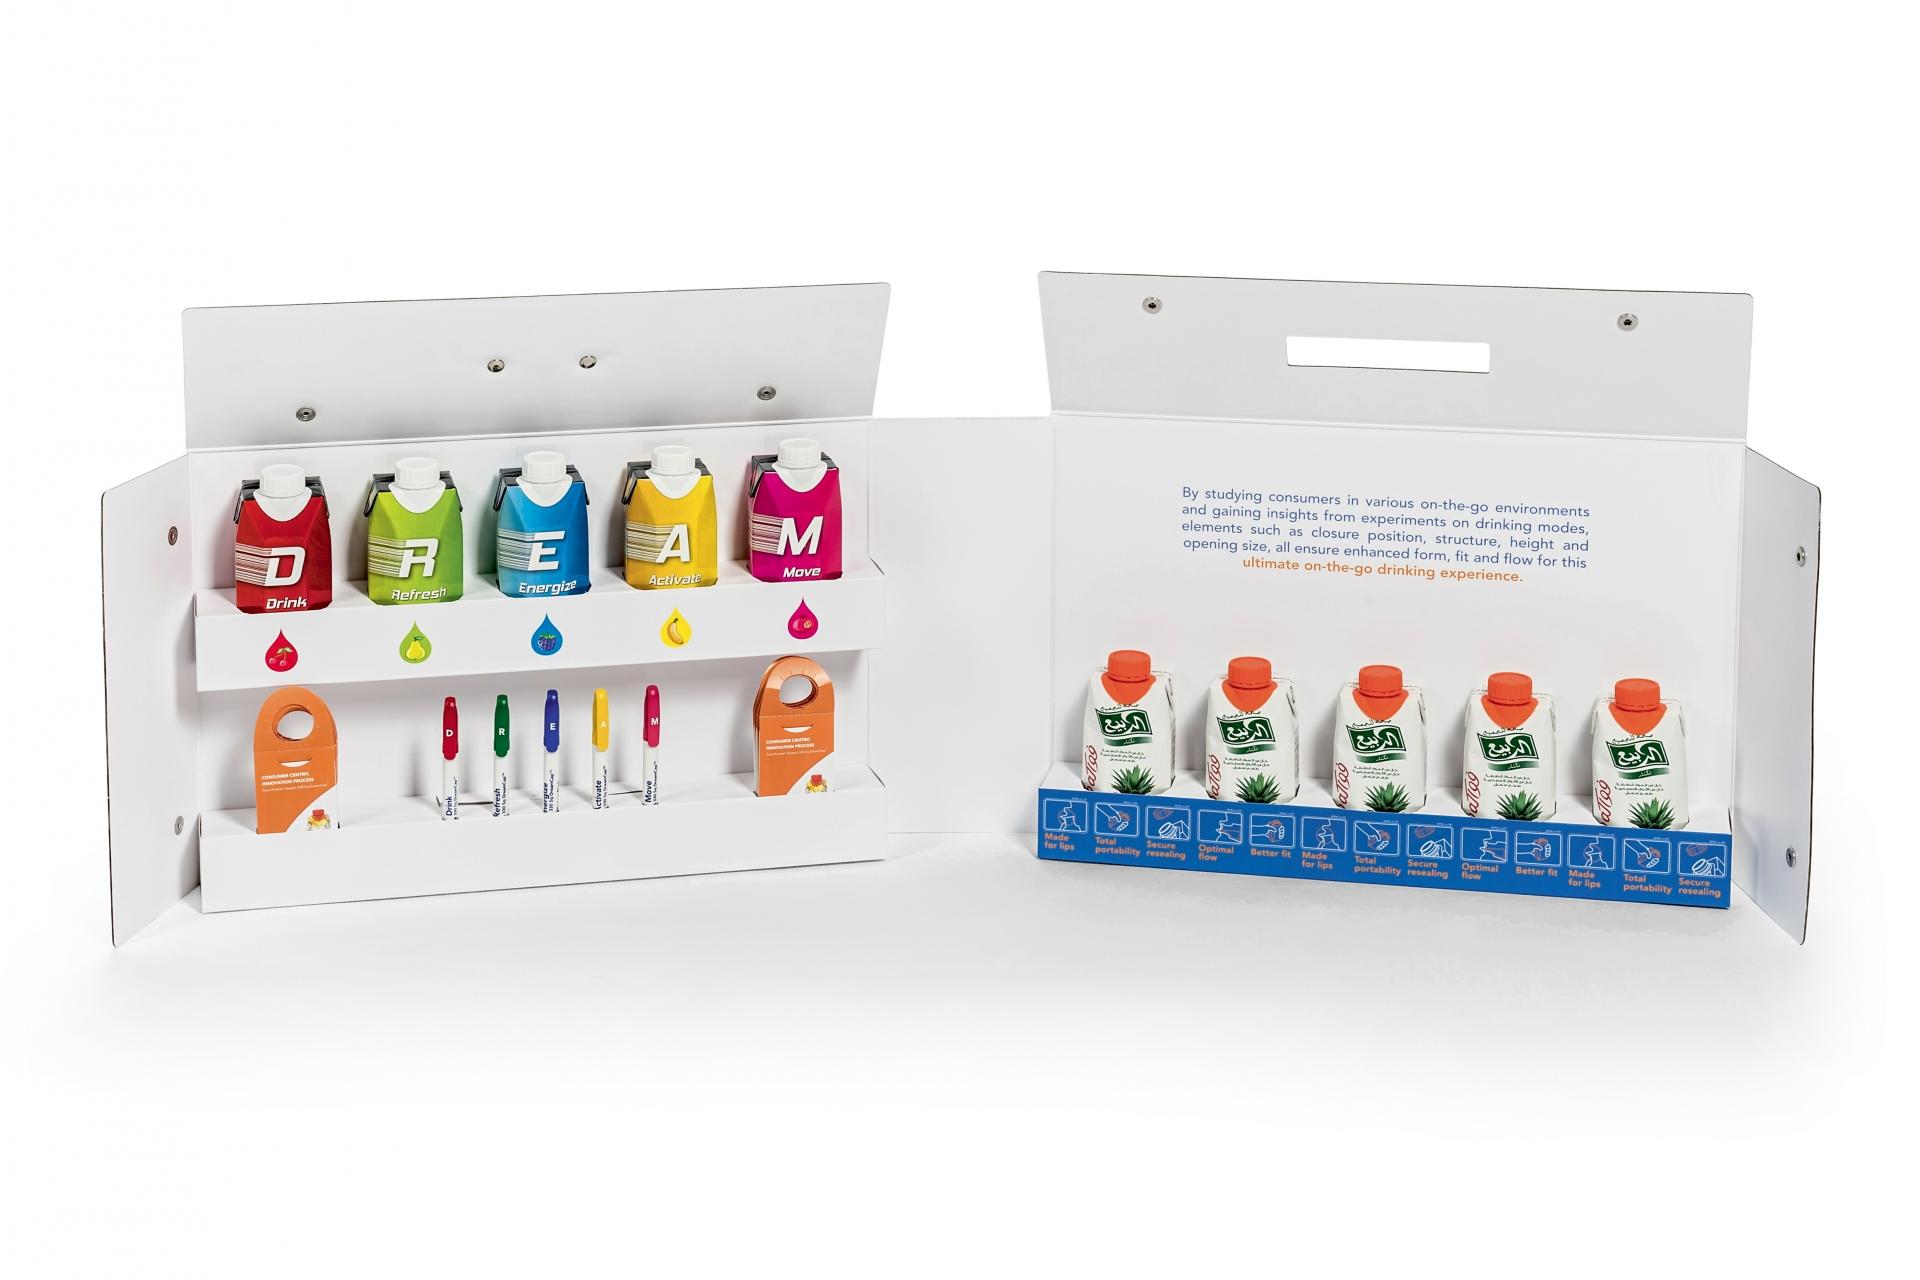 Kit Presentazione | Tetra Pak - Centroffset stampa, packaging, grafica